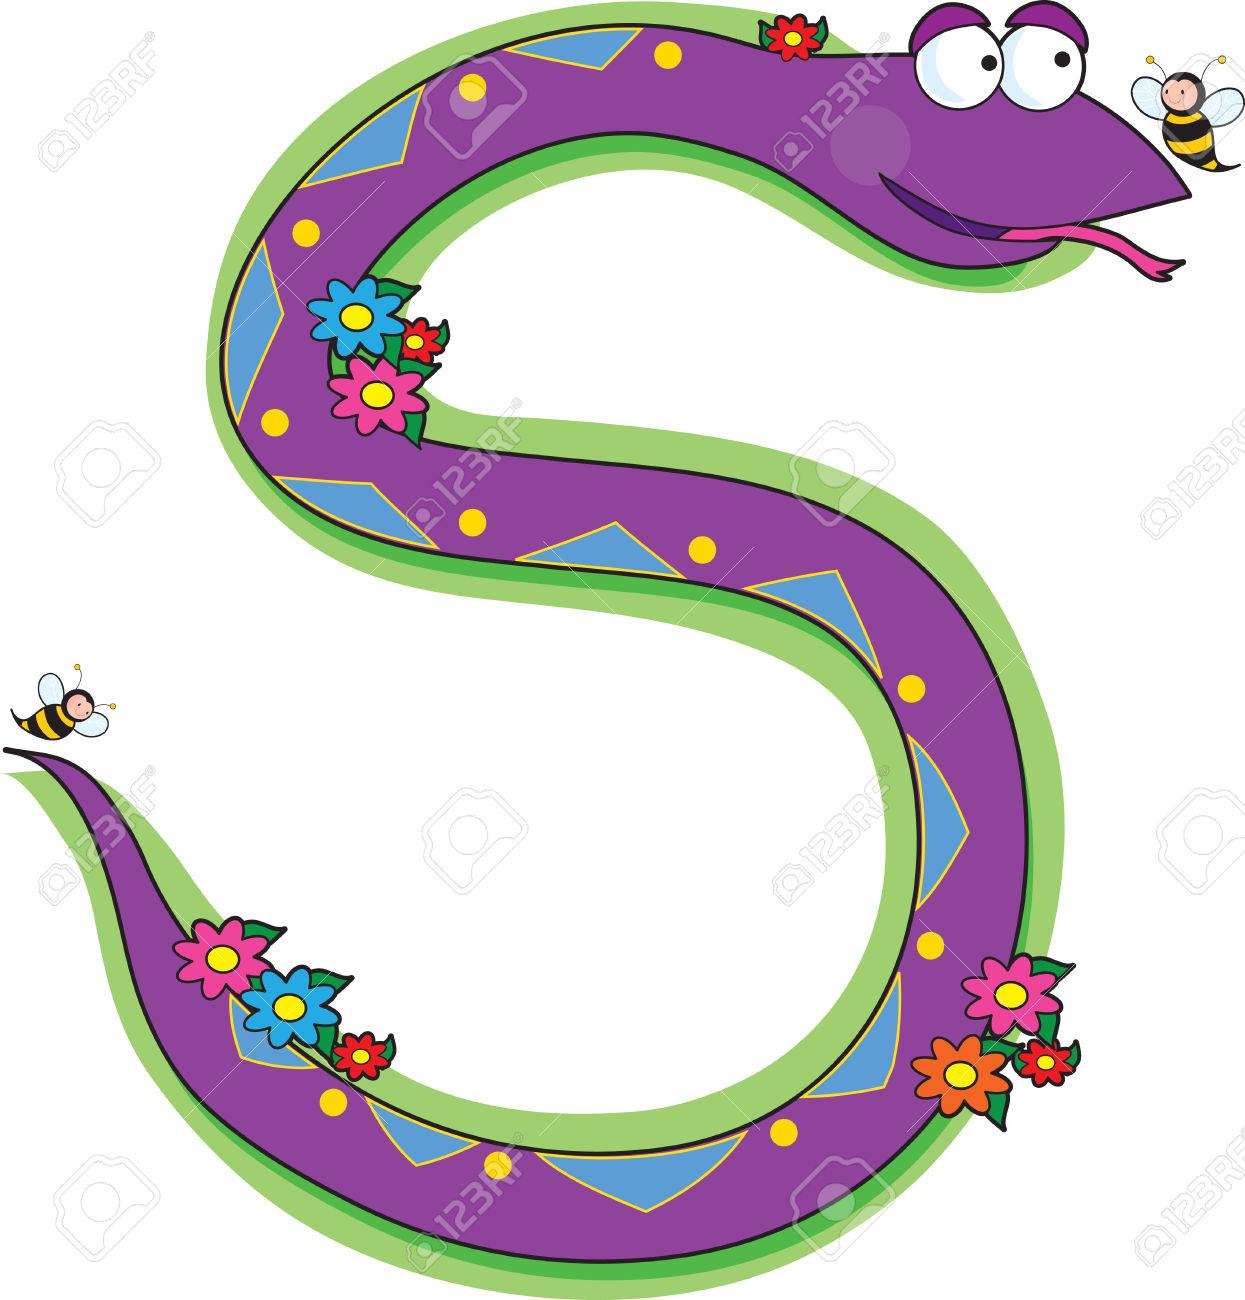 Snake Clipart S Shape & Free Clip Art Images #3612.